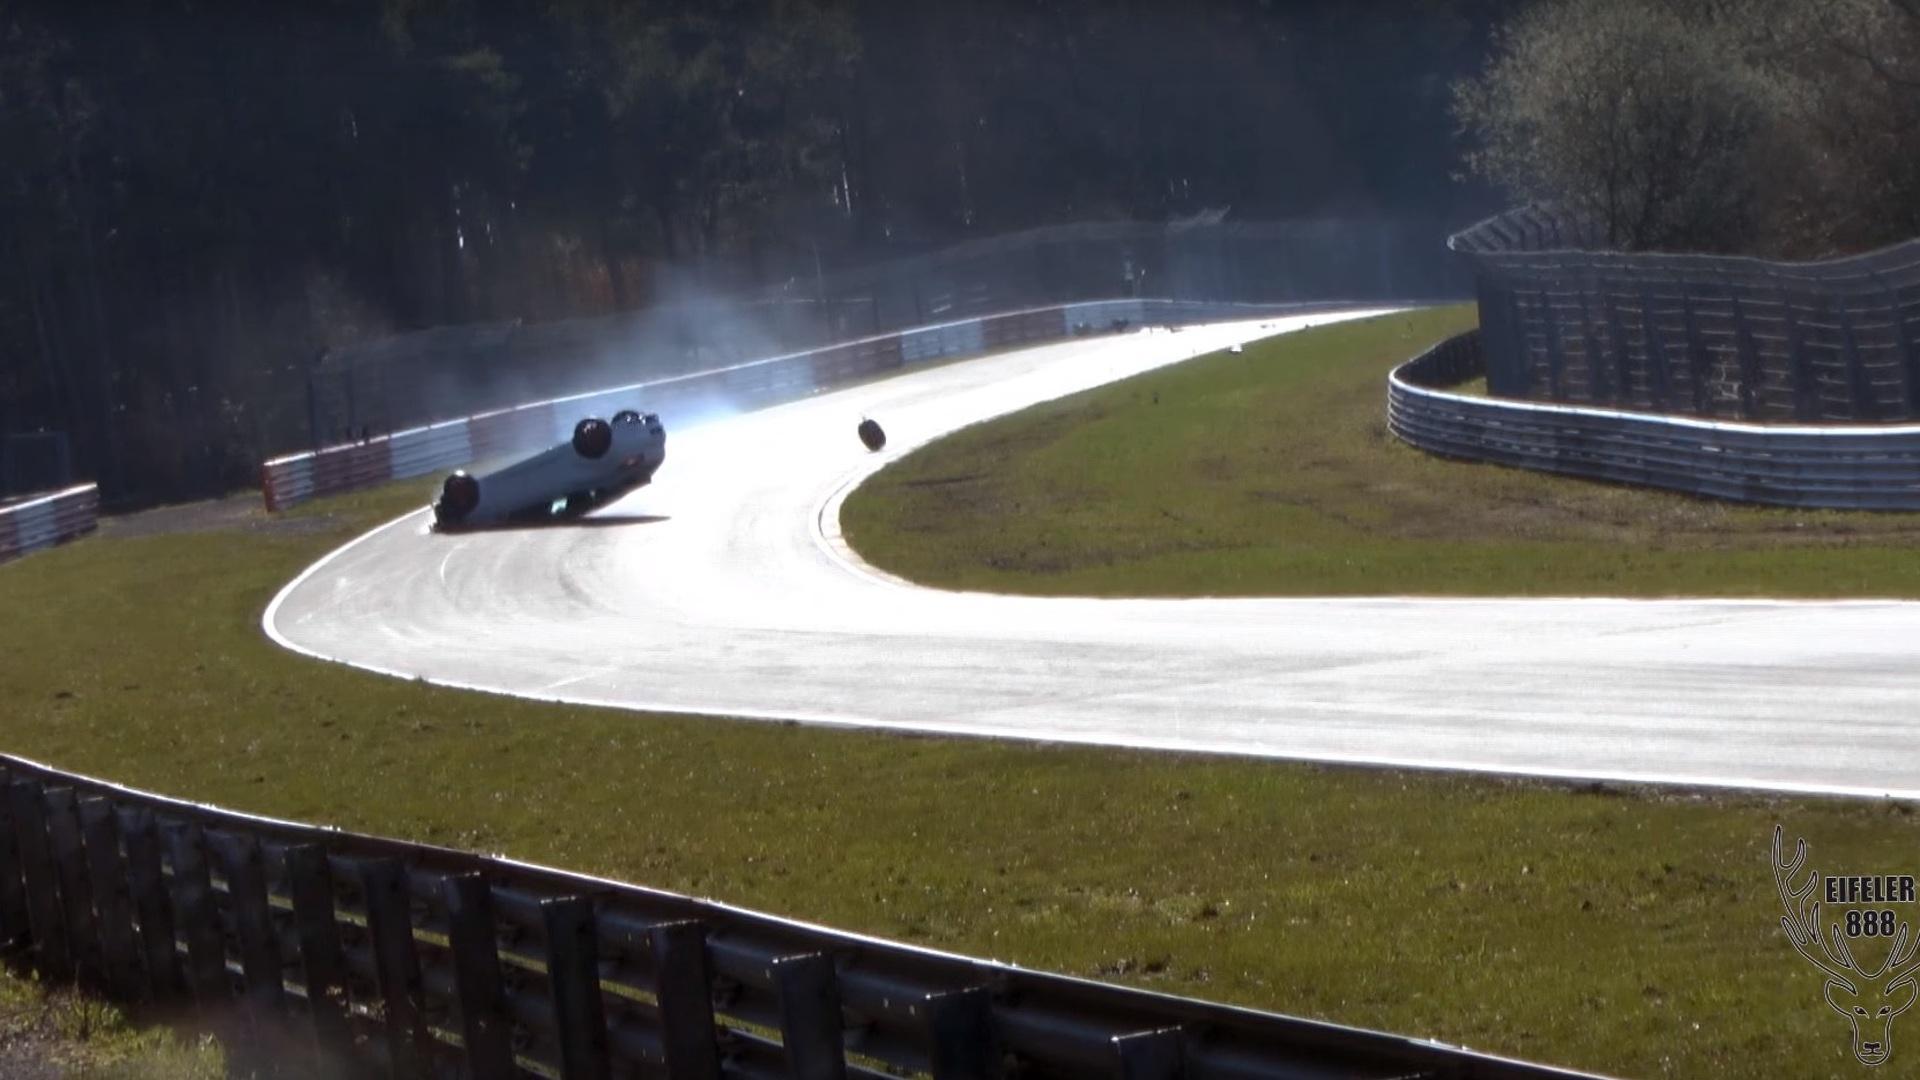 Renault Megane RS flips at Nürburgring after heavy impact